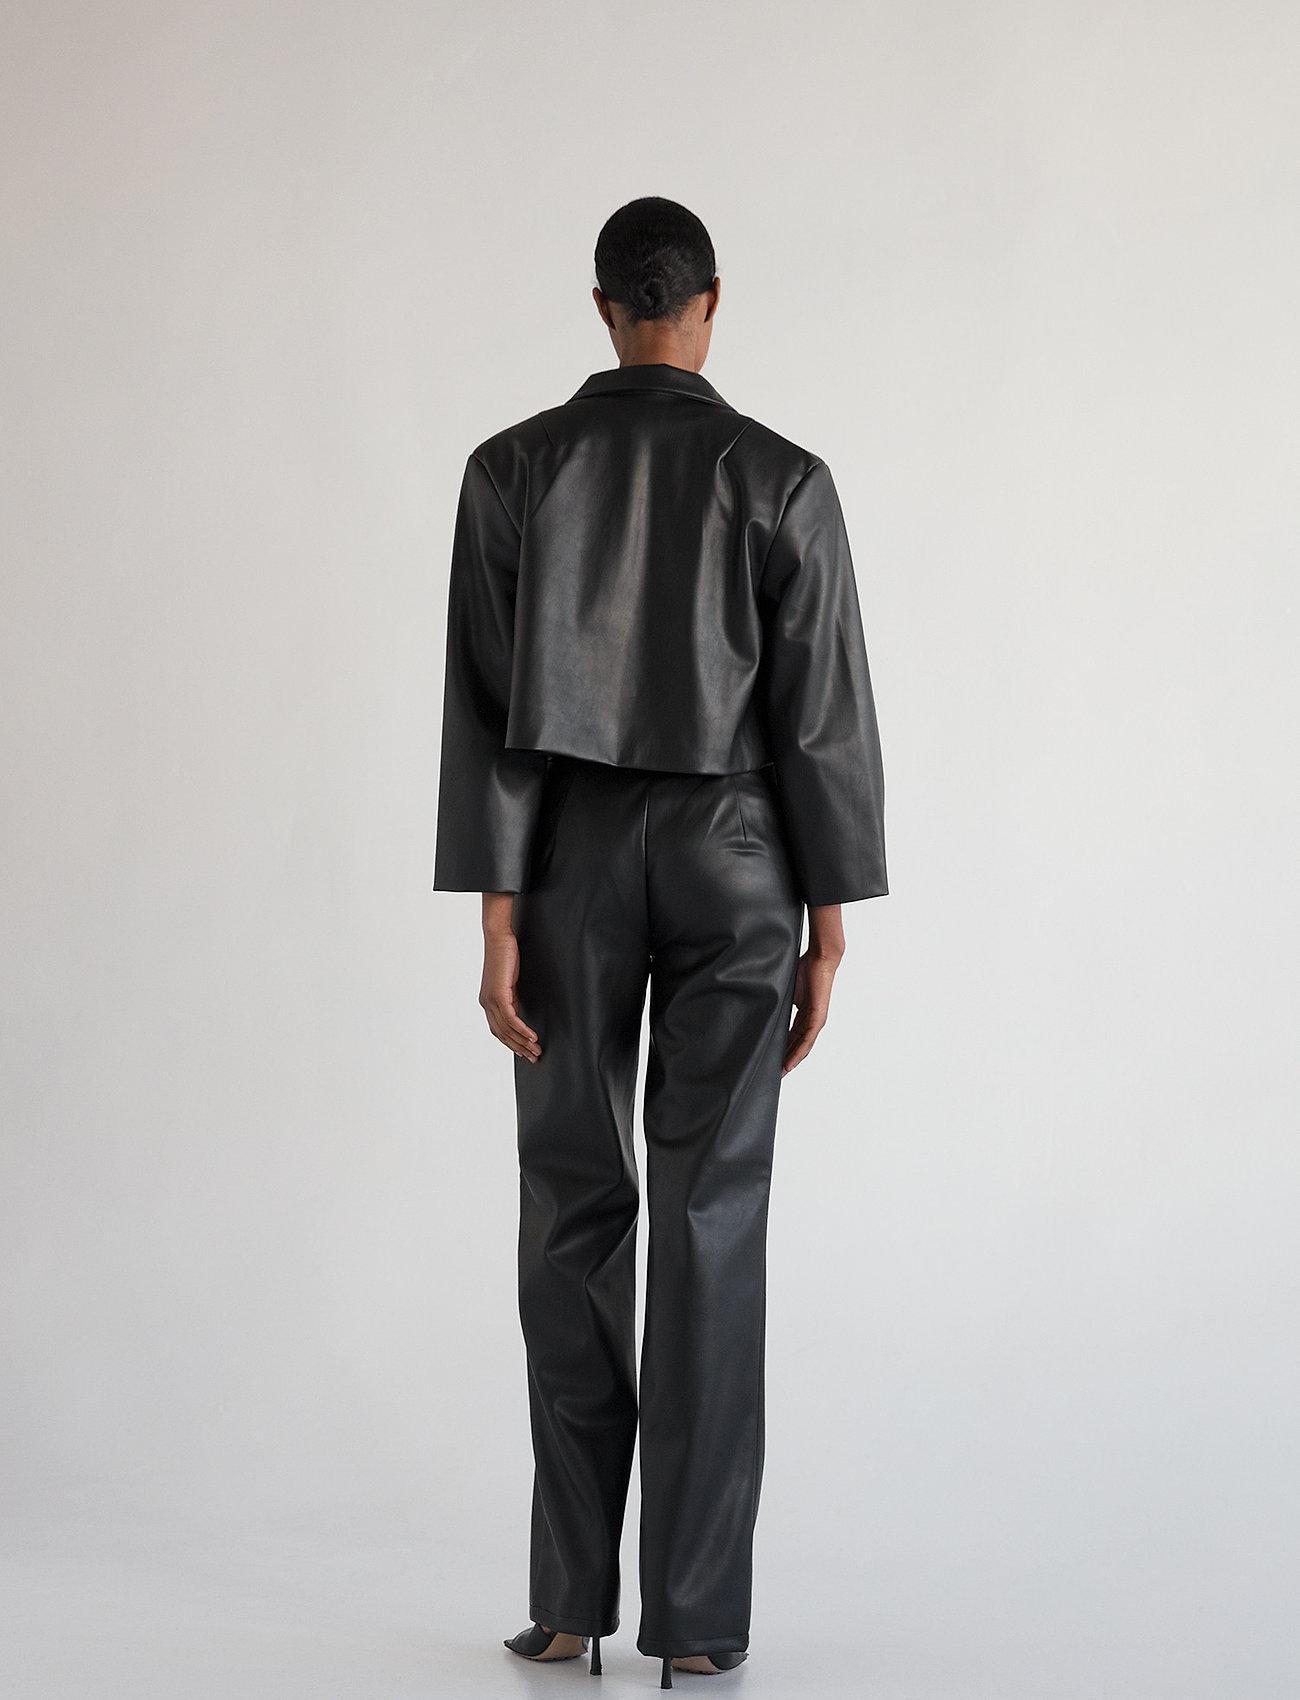 Stylein - VEREL JACKET - lederjacken - black - 3